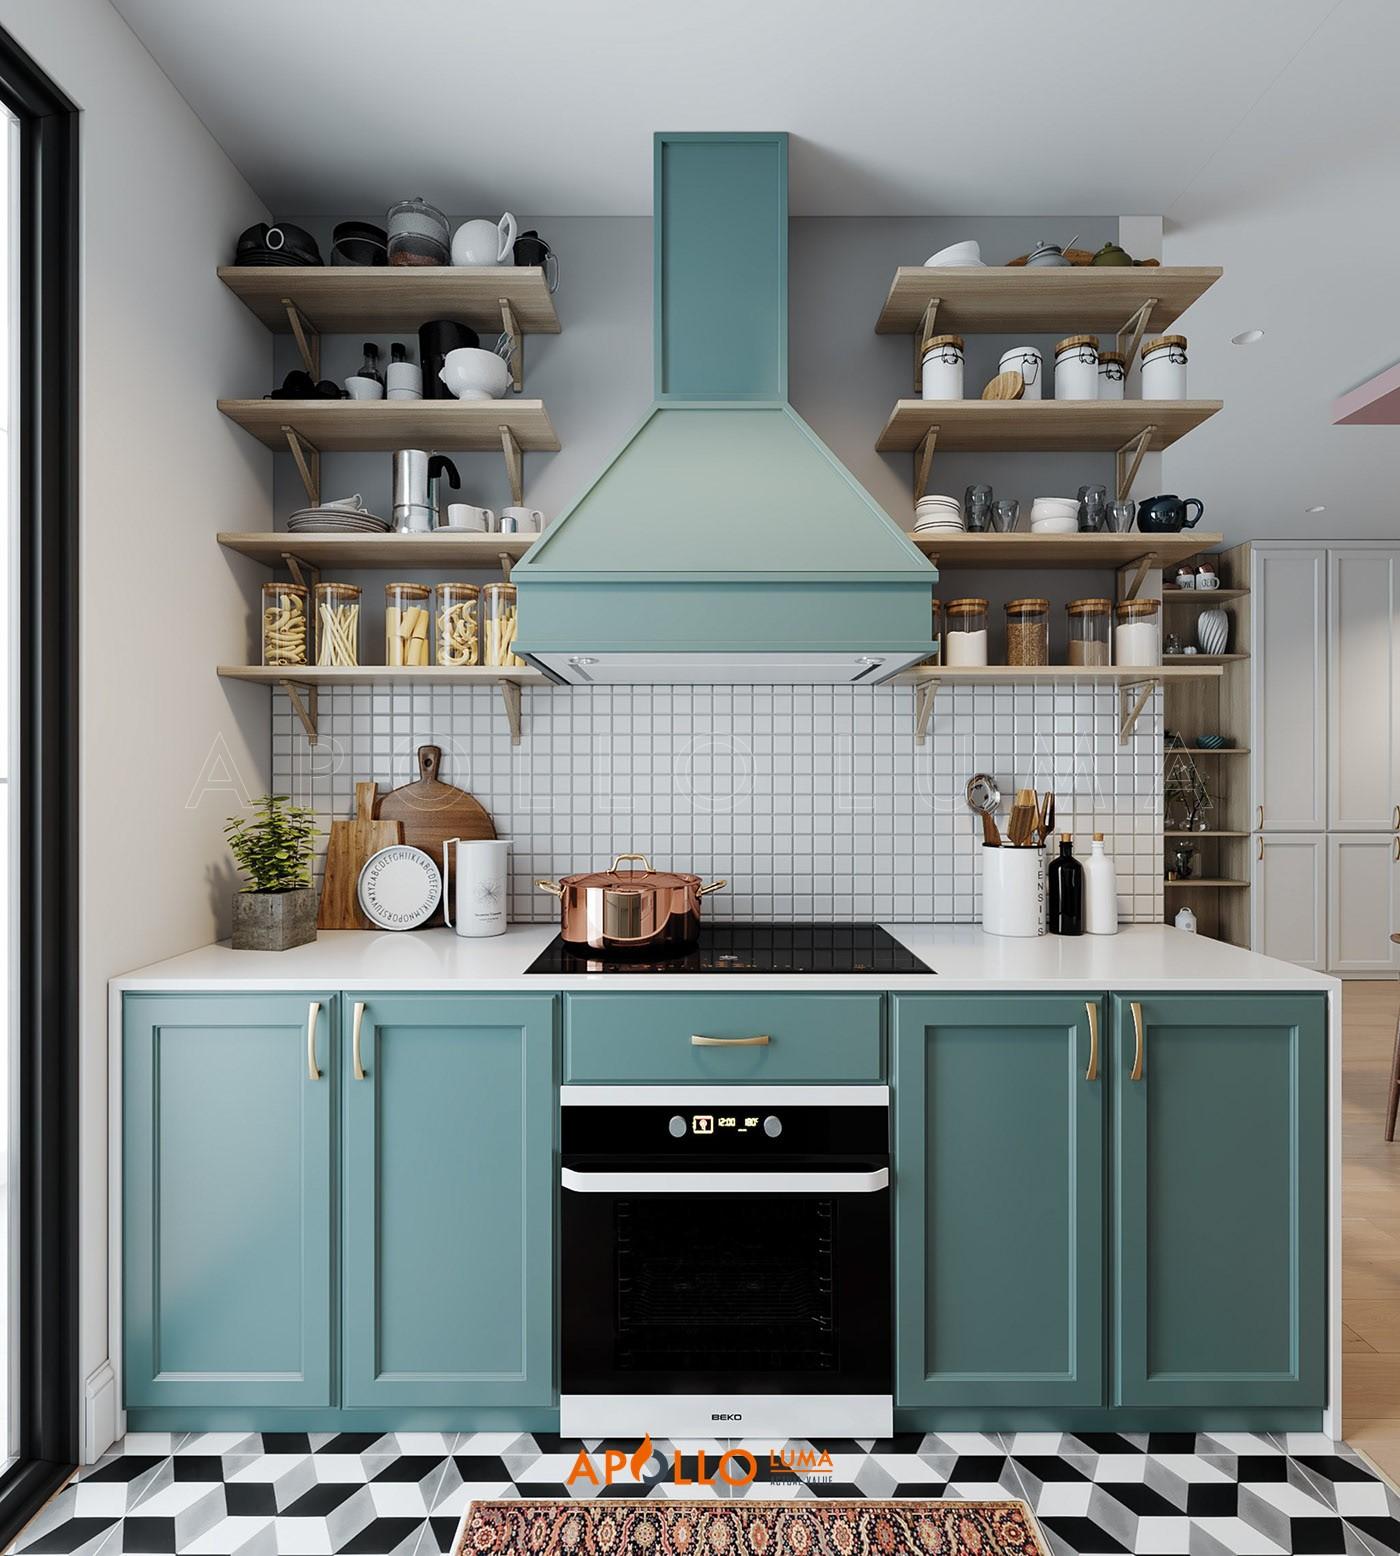 Thiết kế phòng bếp căn hộ Gelexia Riverside phong cách Scandinavian